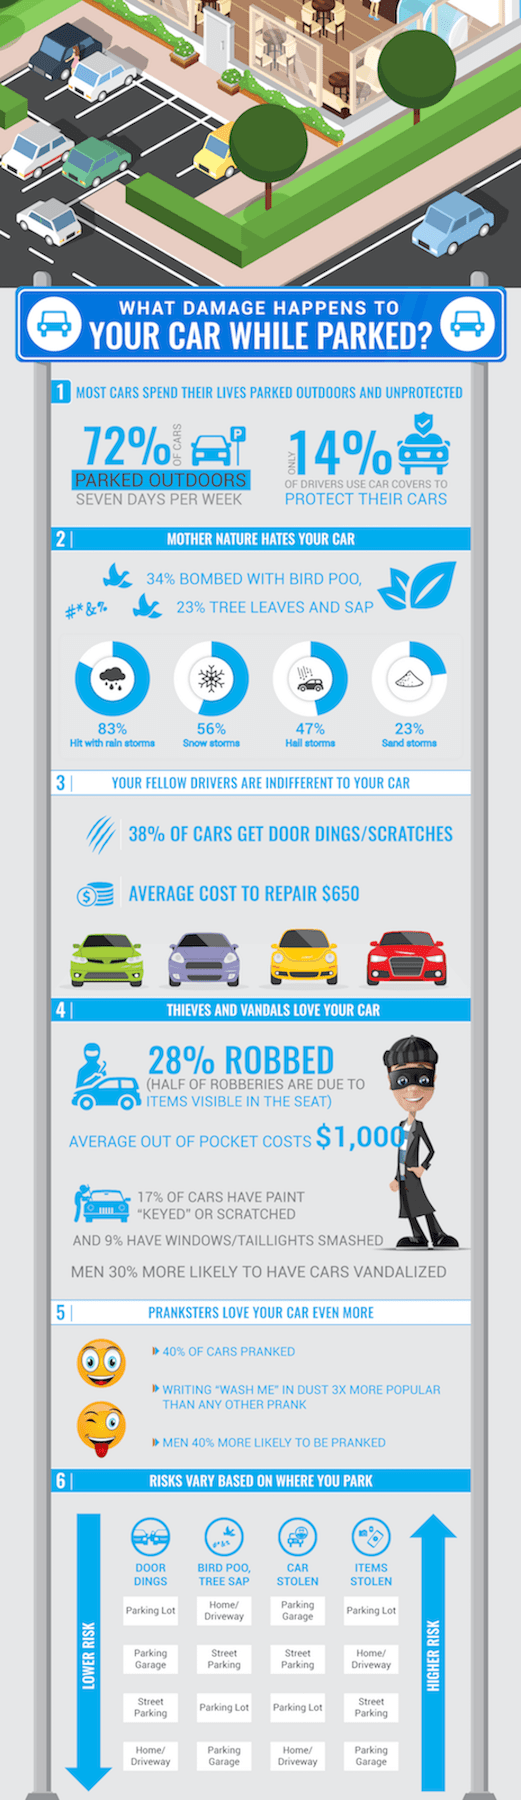 Parked Car Damage